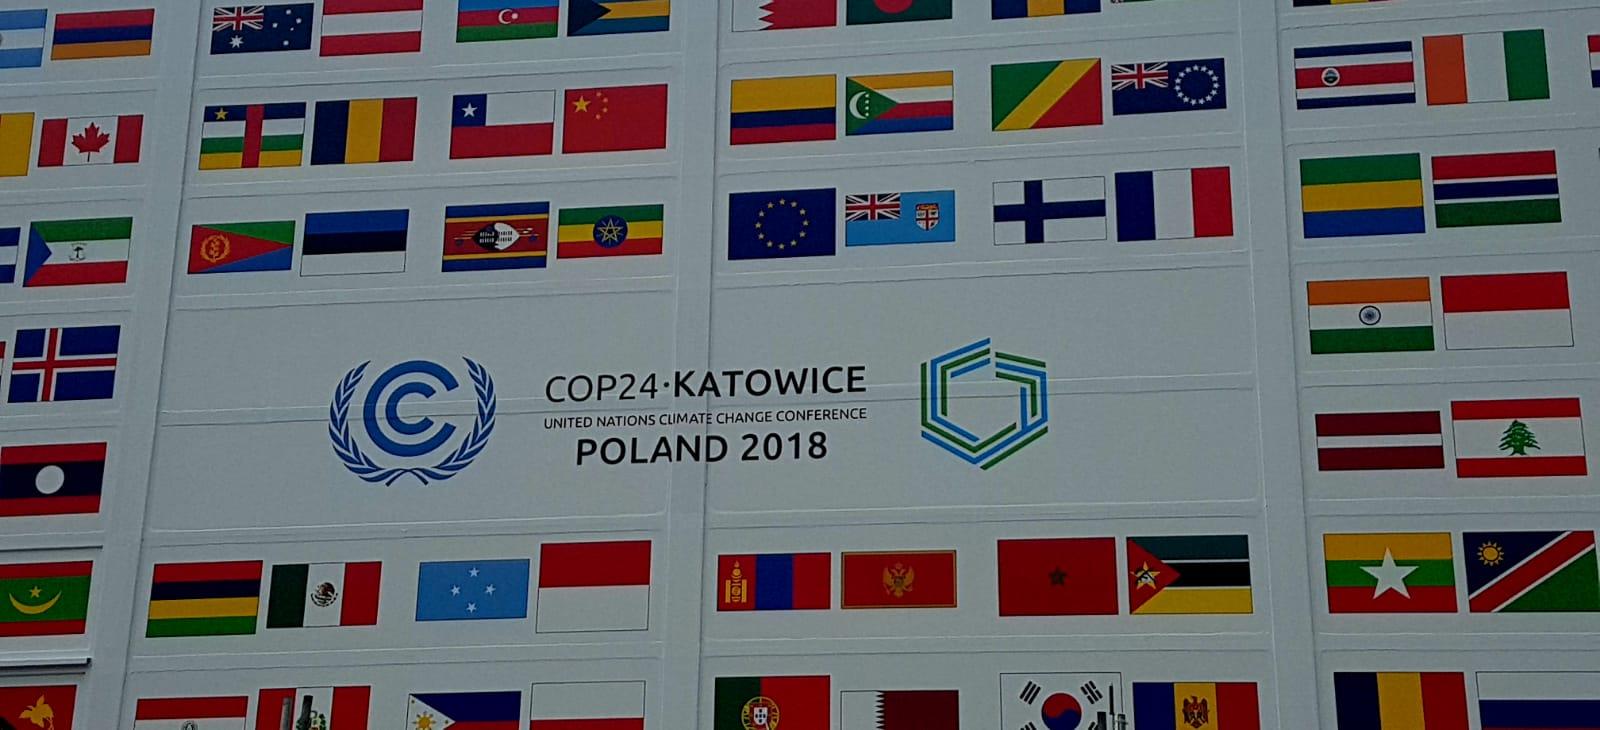 Cop24 Katowice Poster